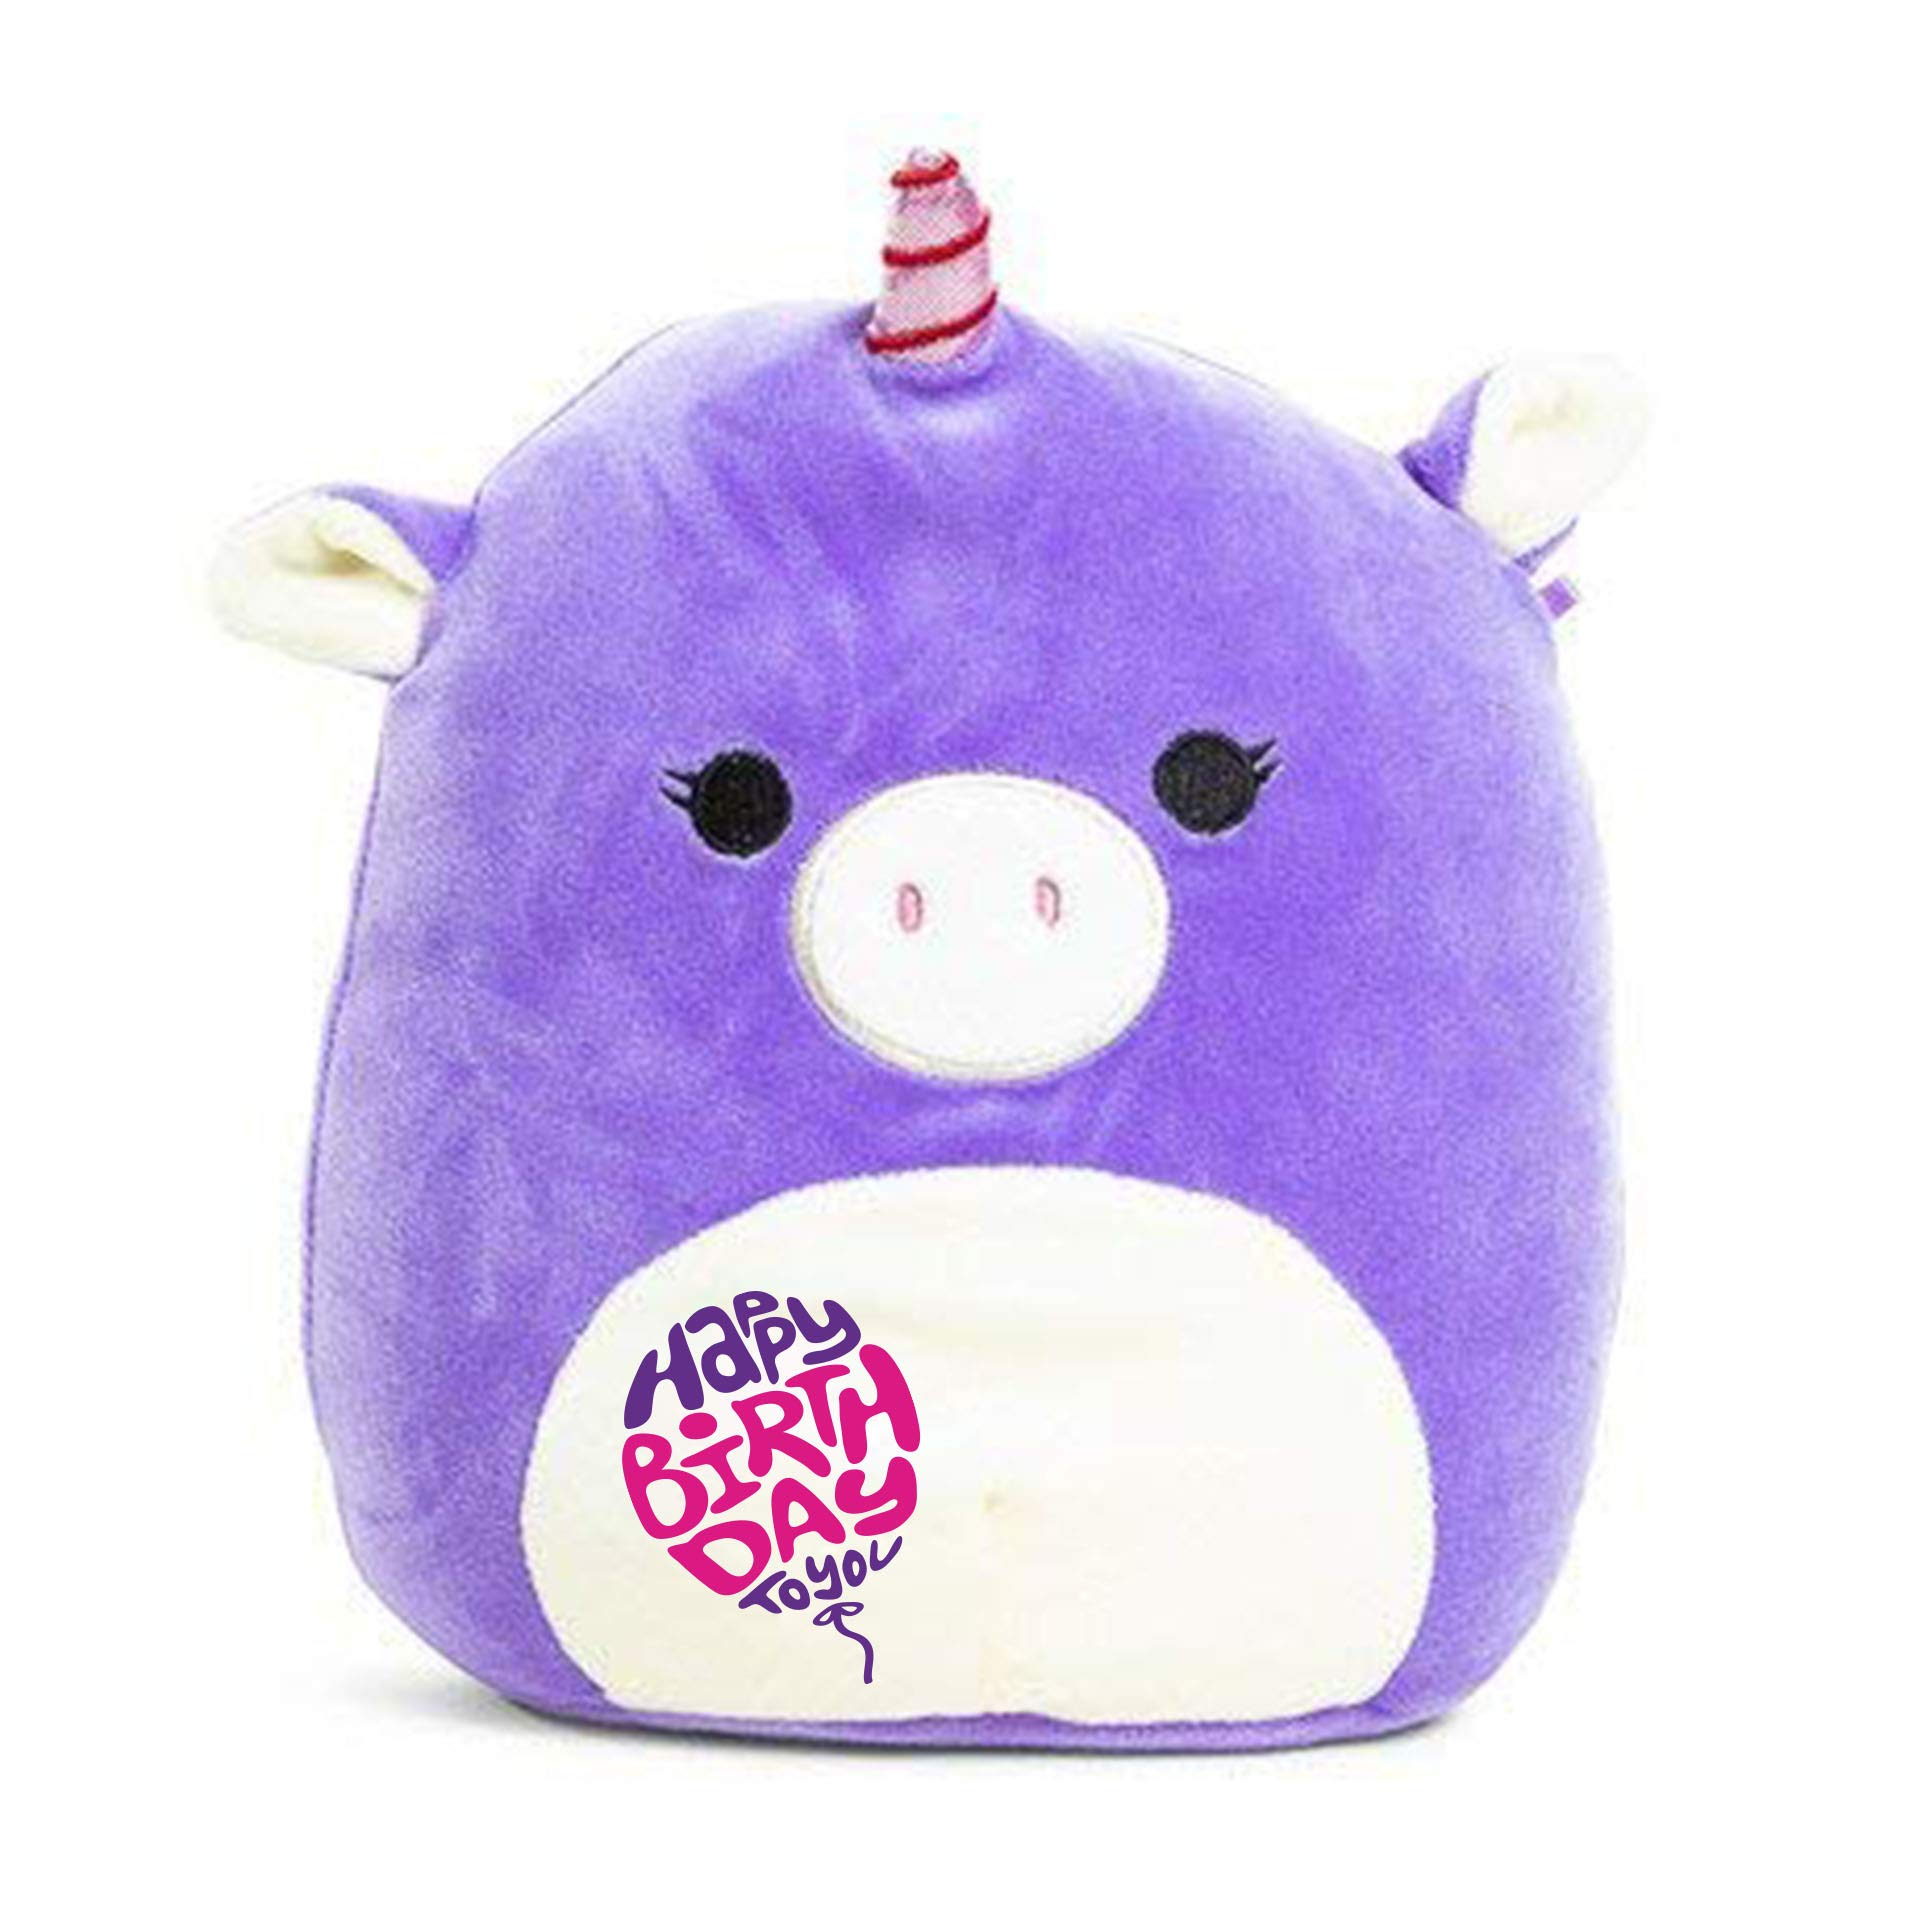 Limited Edition! Happy Birthday Squishmallow Pre-Customized for Birthday Original Kellytoy 13'' Unicorn Super Soft Plush Stuffed Animal Pillow by CustomizedbyBilgin